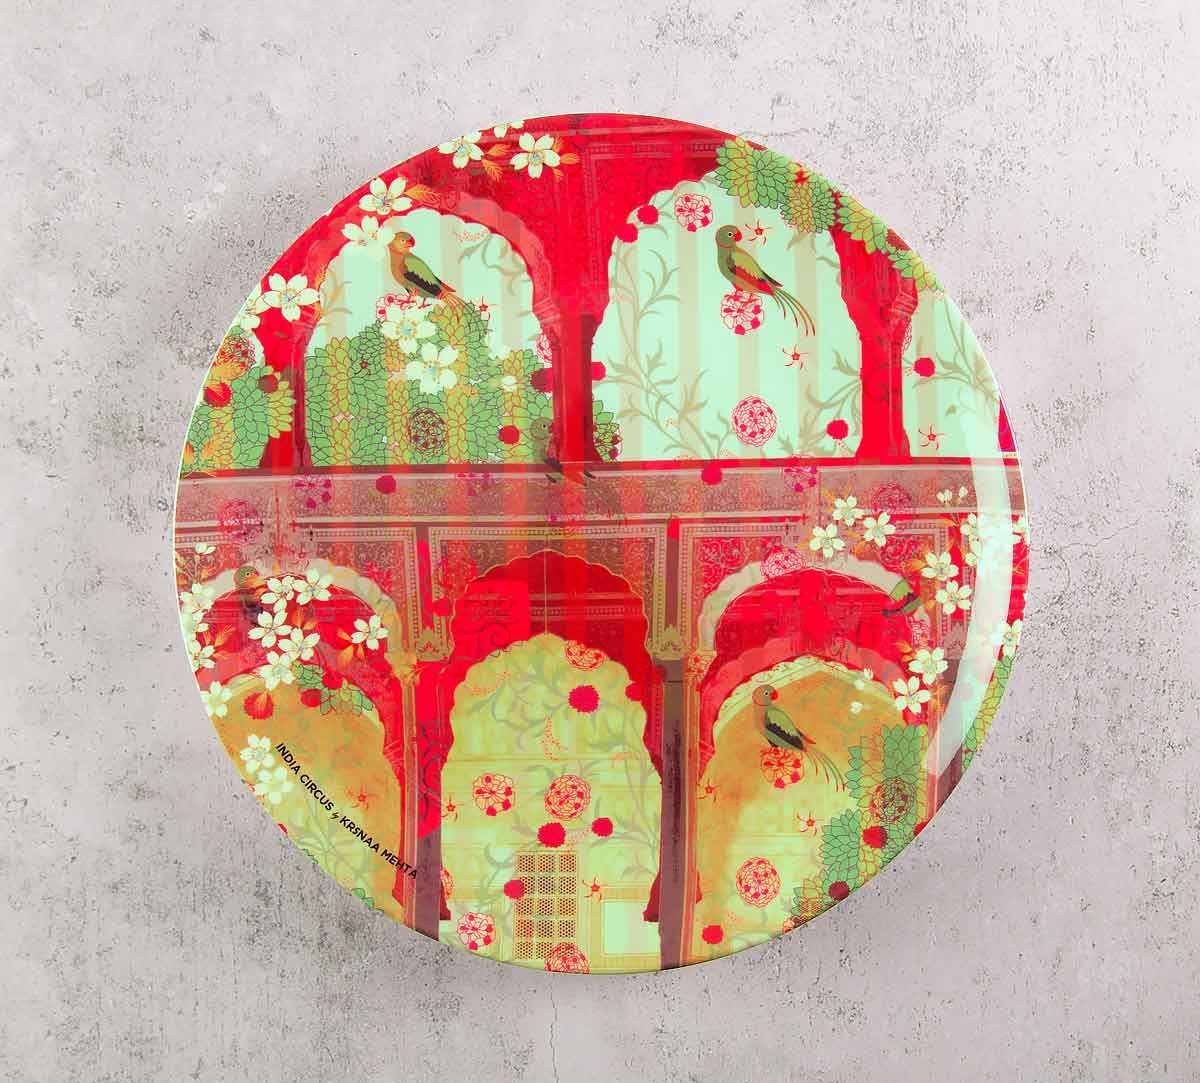 India Circus Capacious Corridor 8 inch Decorative and Snacks Platter